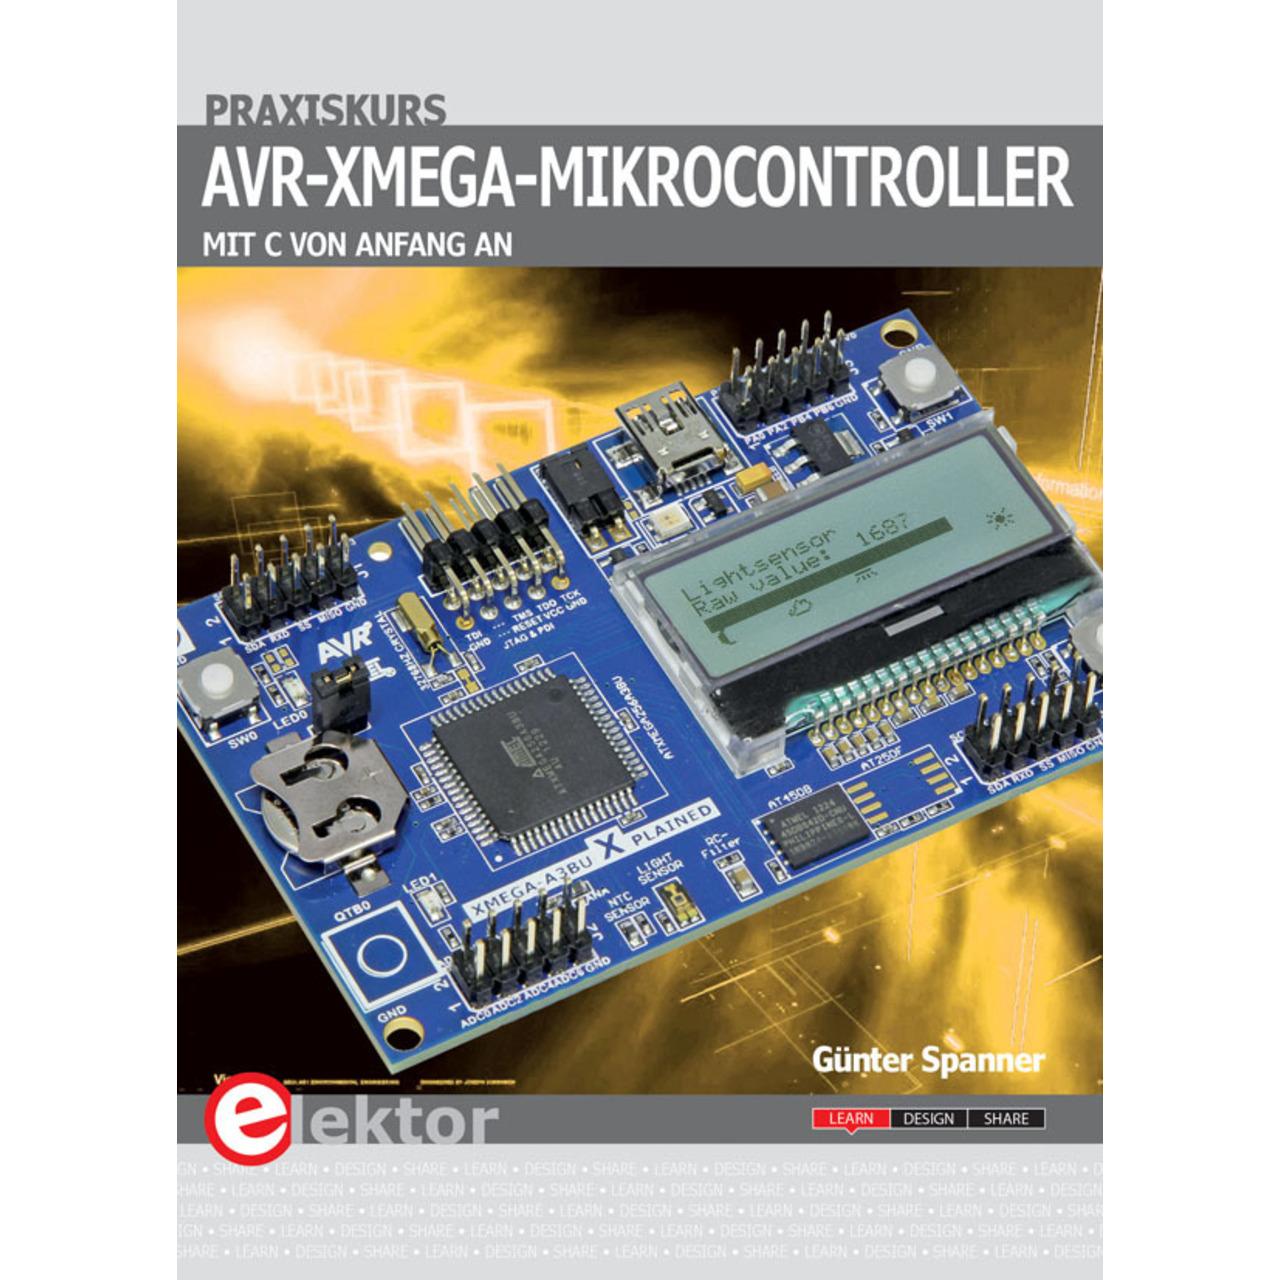 Elektor Praxiskurs AVR-XMEGA-Mikrocontroller